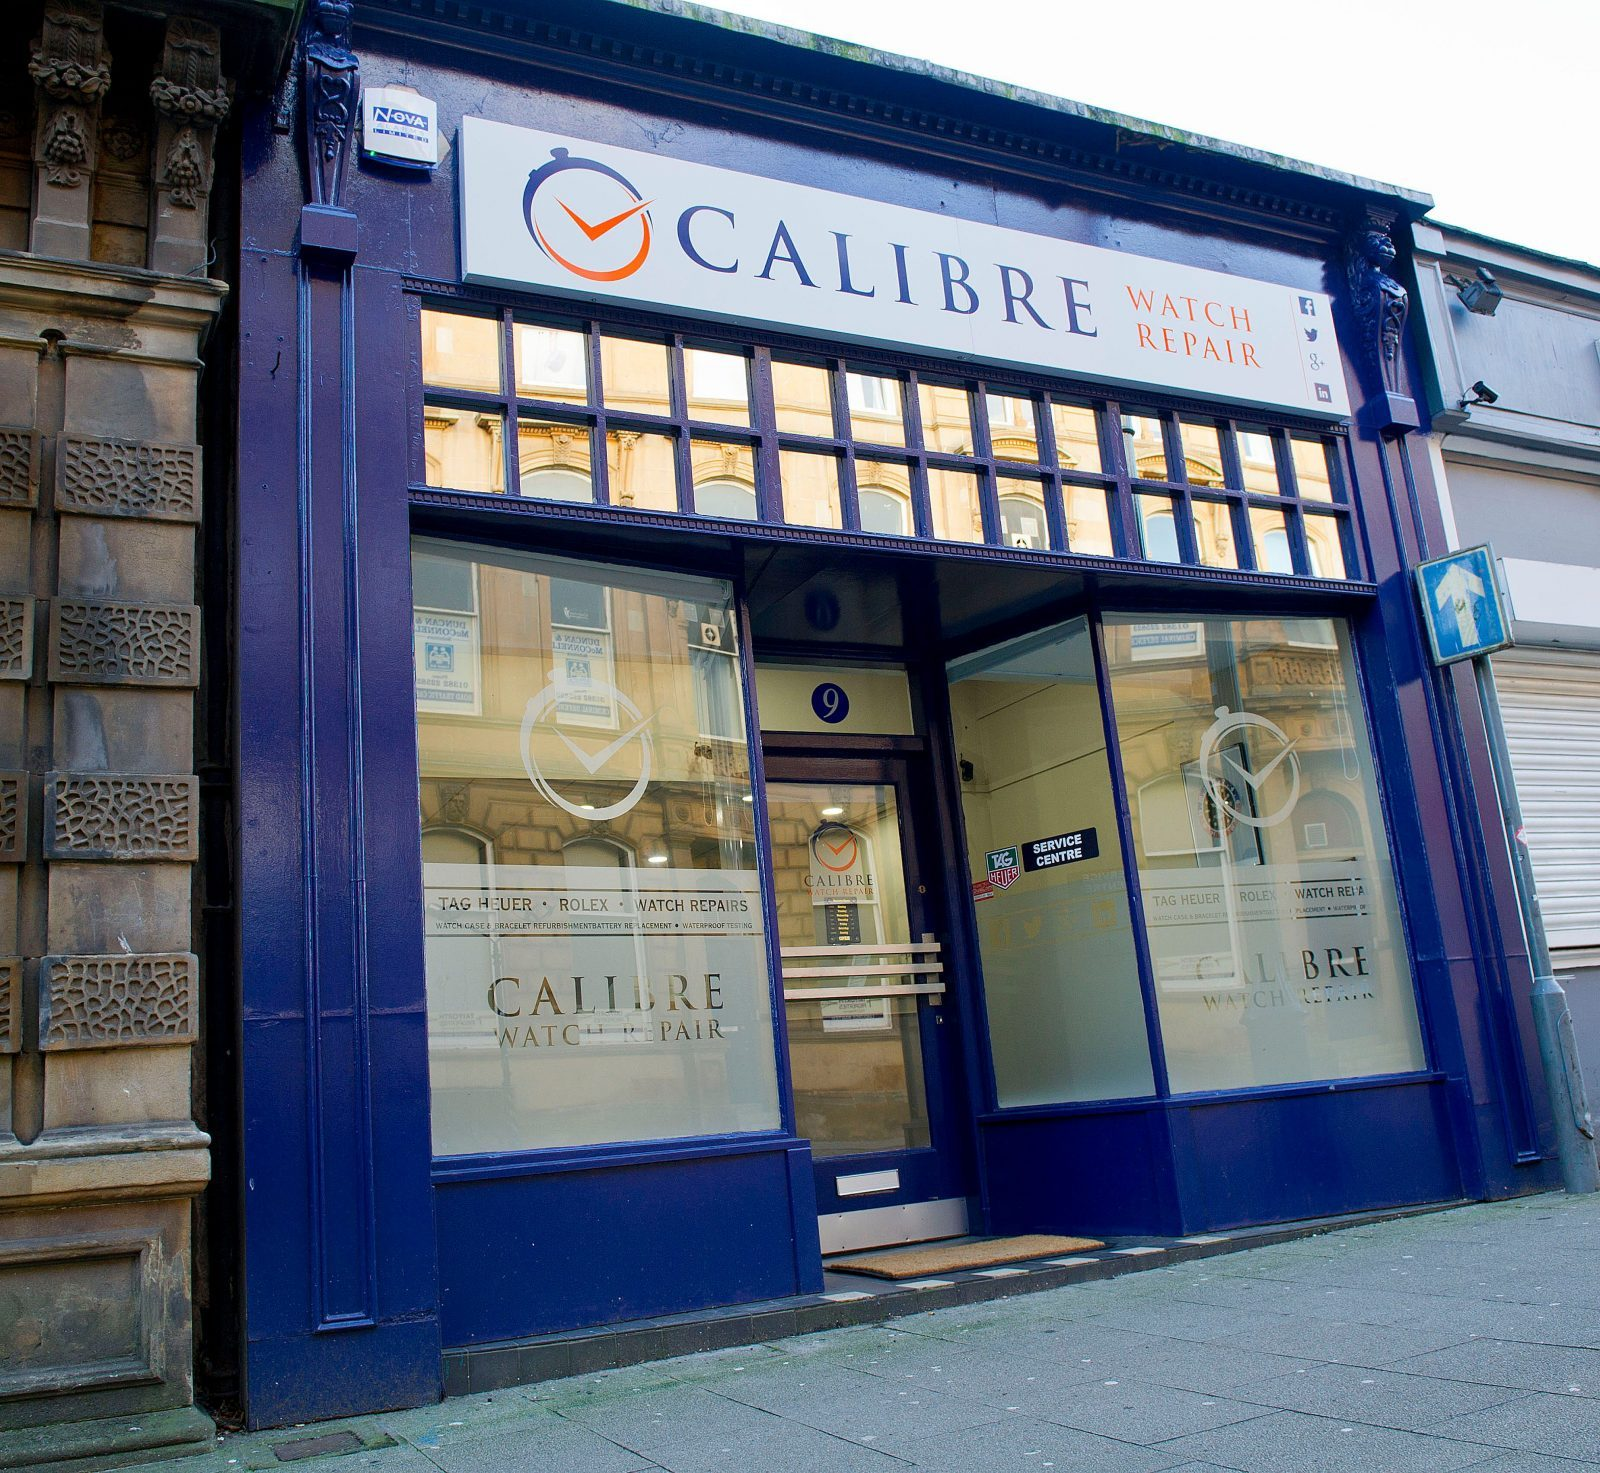 outside calibre watch repair shop